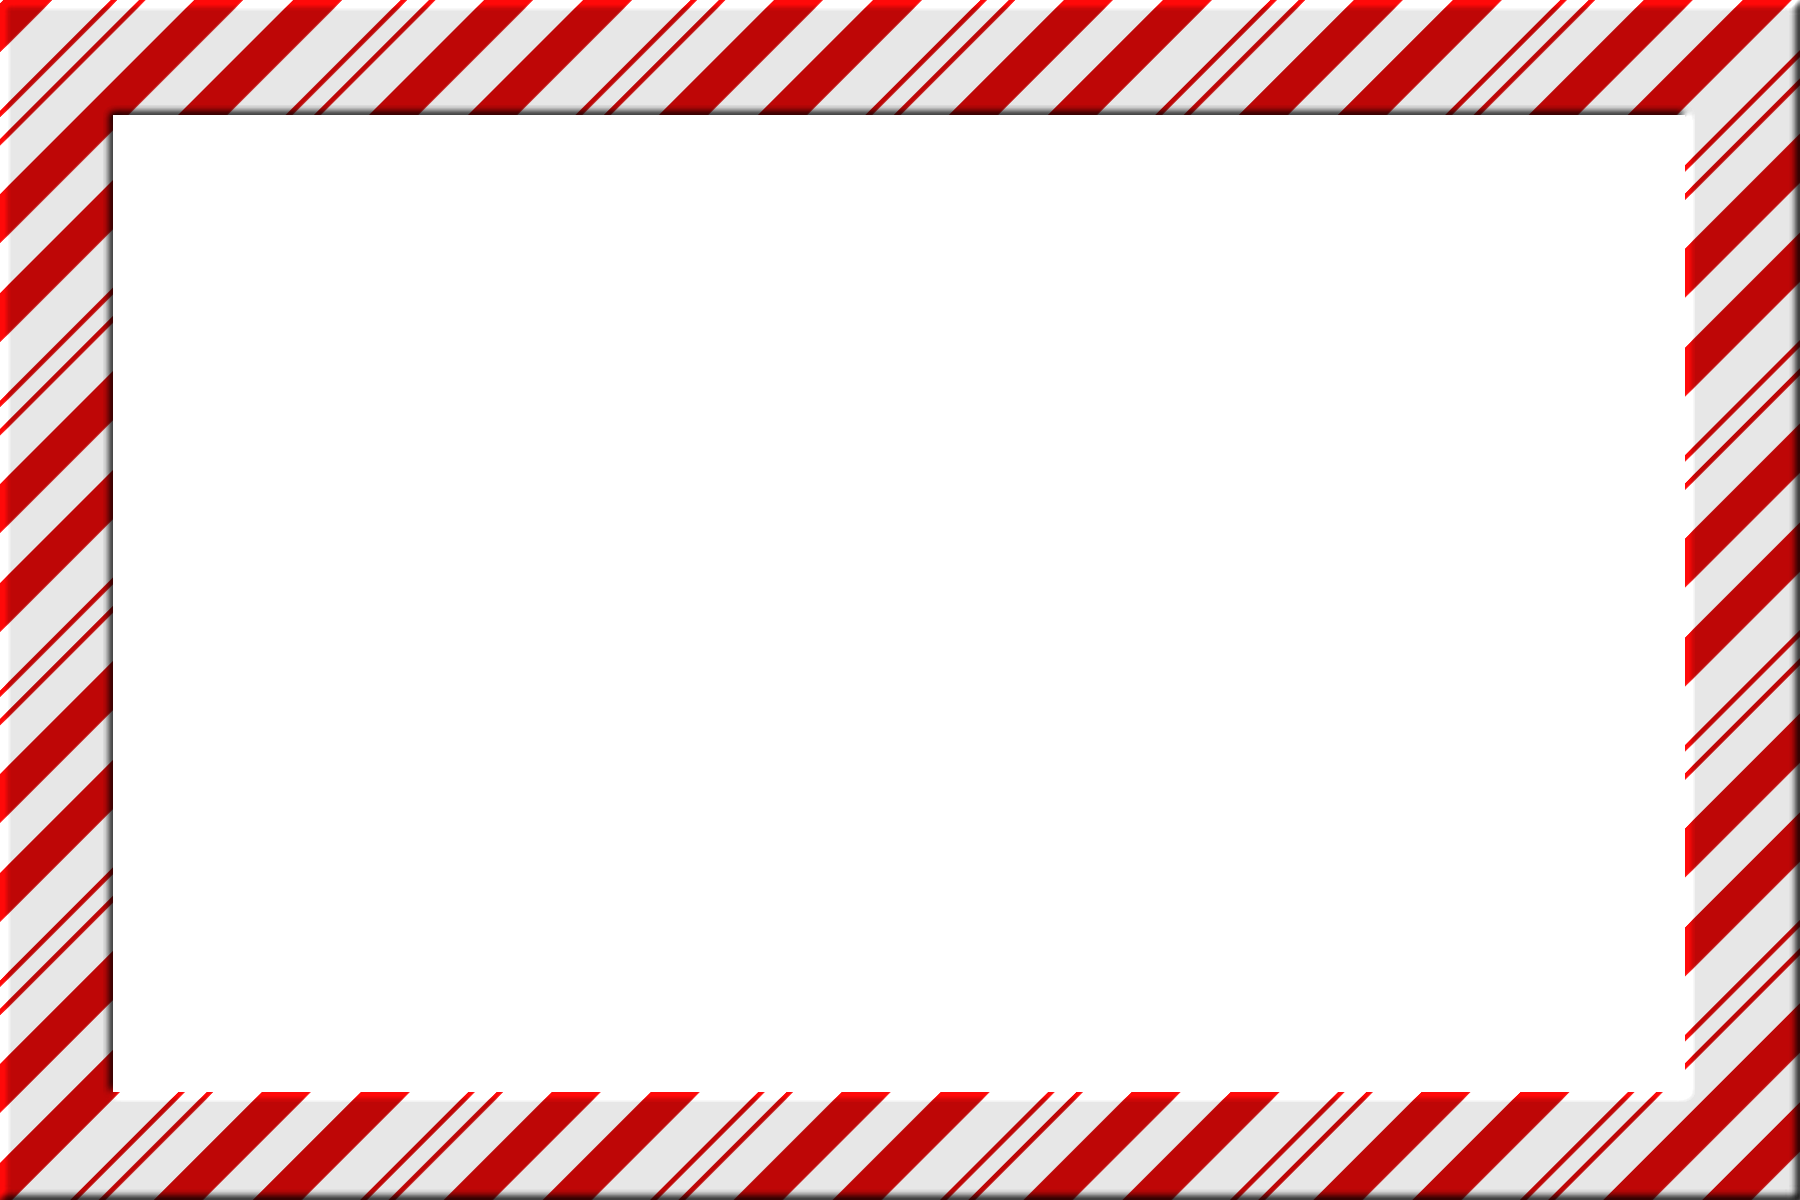 Clip Art Candy Cane Border Clip Art candy border clipart kid cane borders 512 x 51 kb jpeg 470